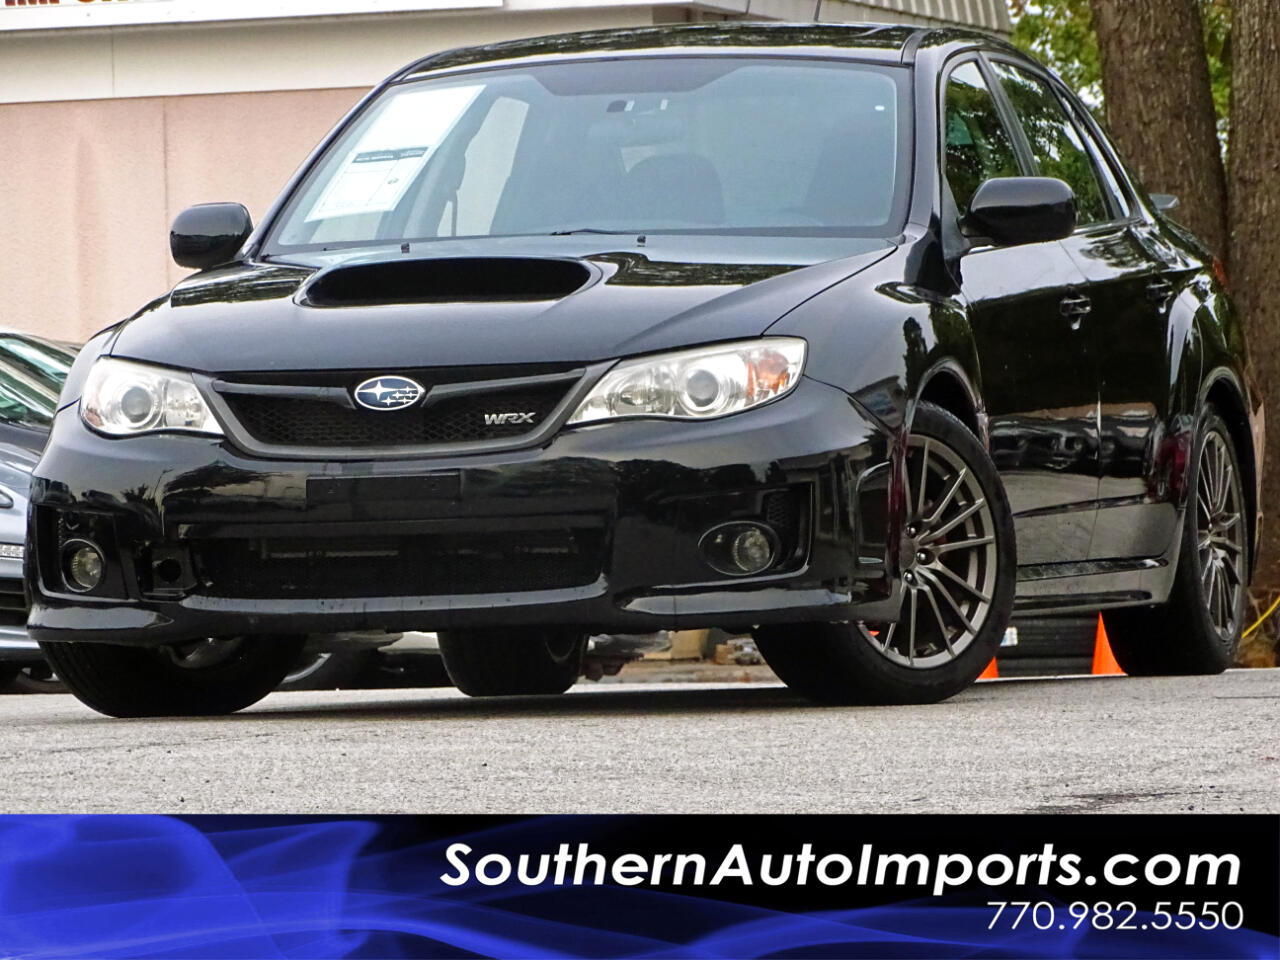 2012 Subaru Impreza WRX WRX PREMIUM W/SUNROOF HEATED SEATS